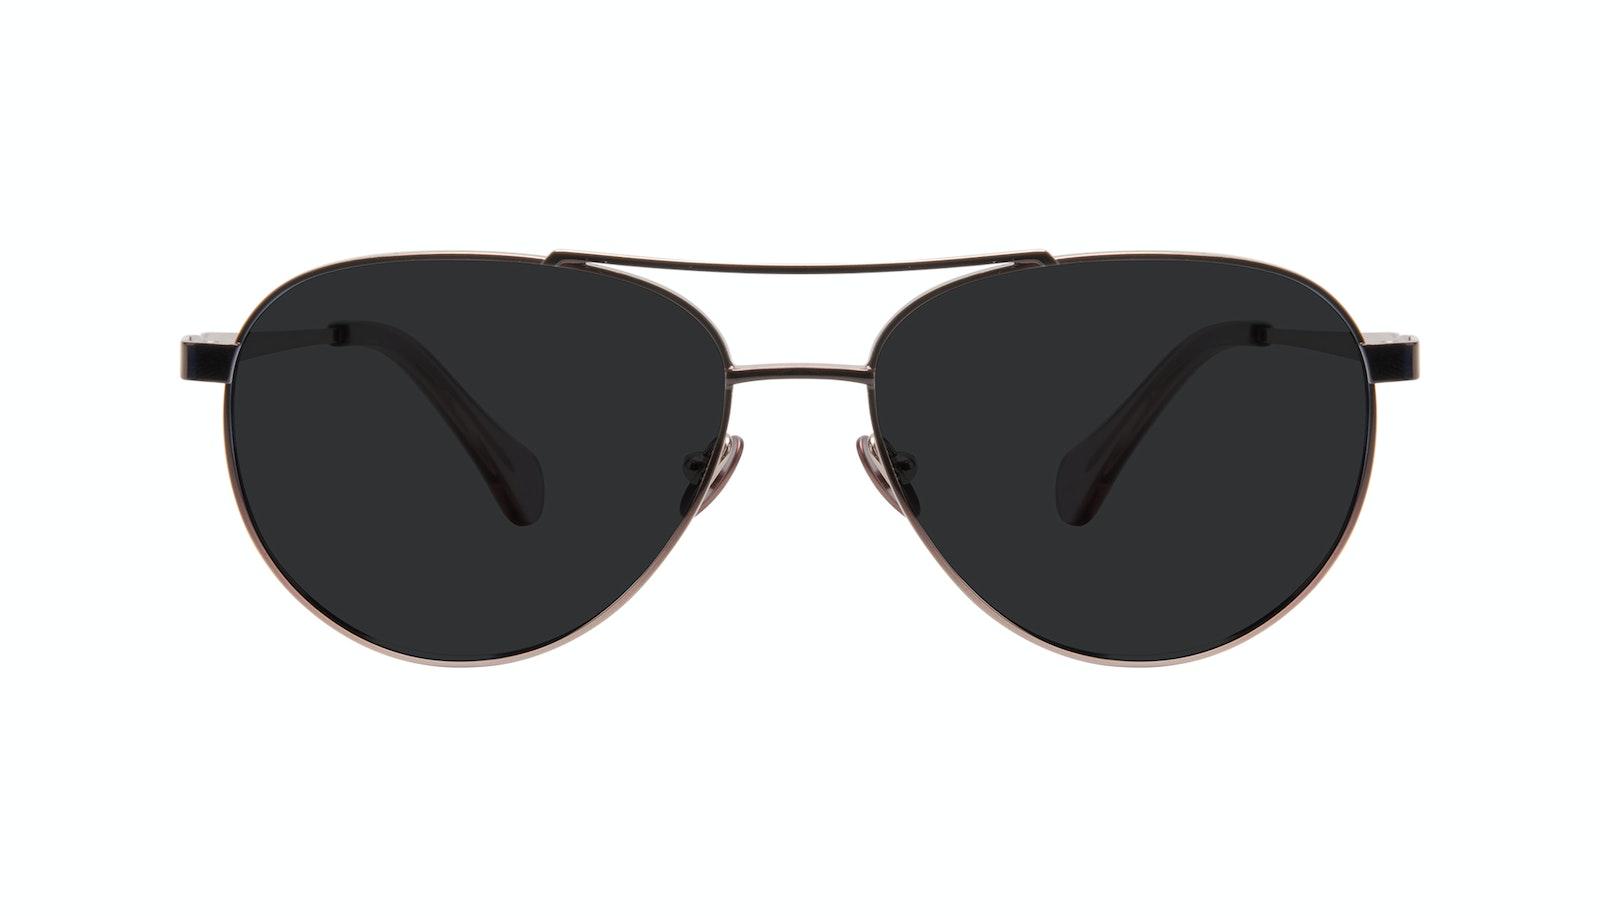 Affordable Fashion Glasses Aviator Sunglasses Women Boyfriend Pink Terra